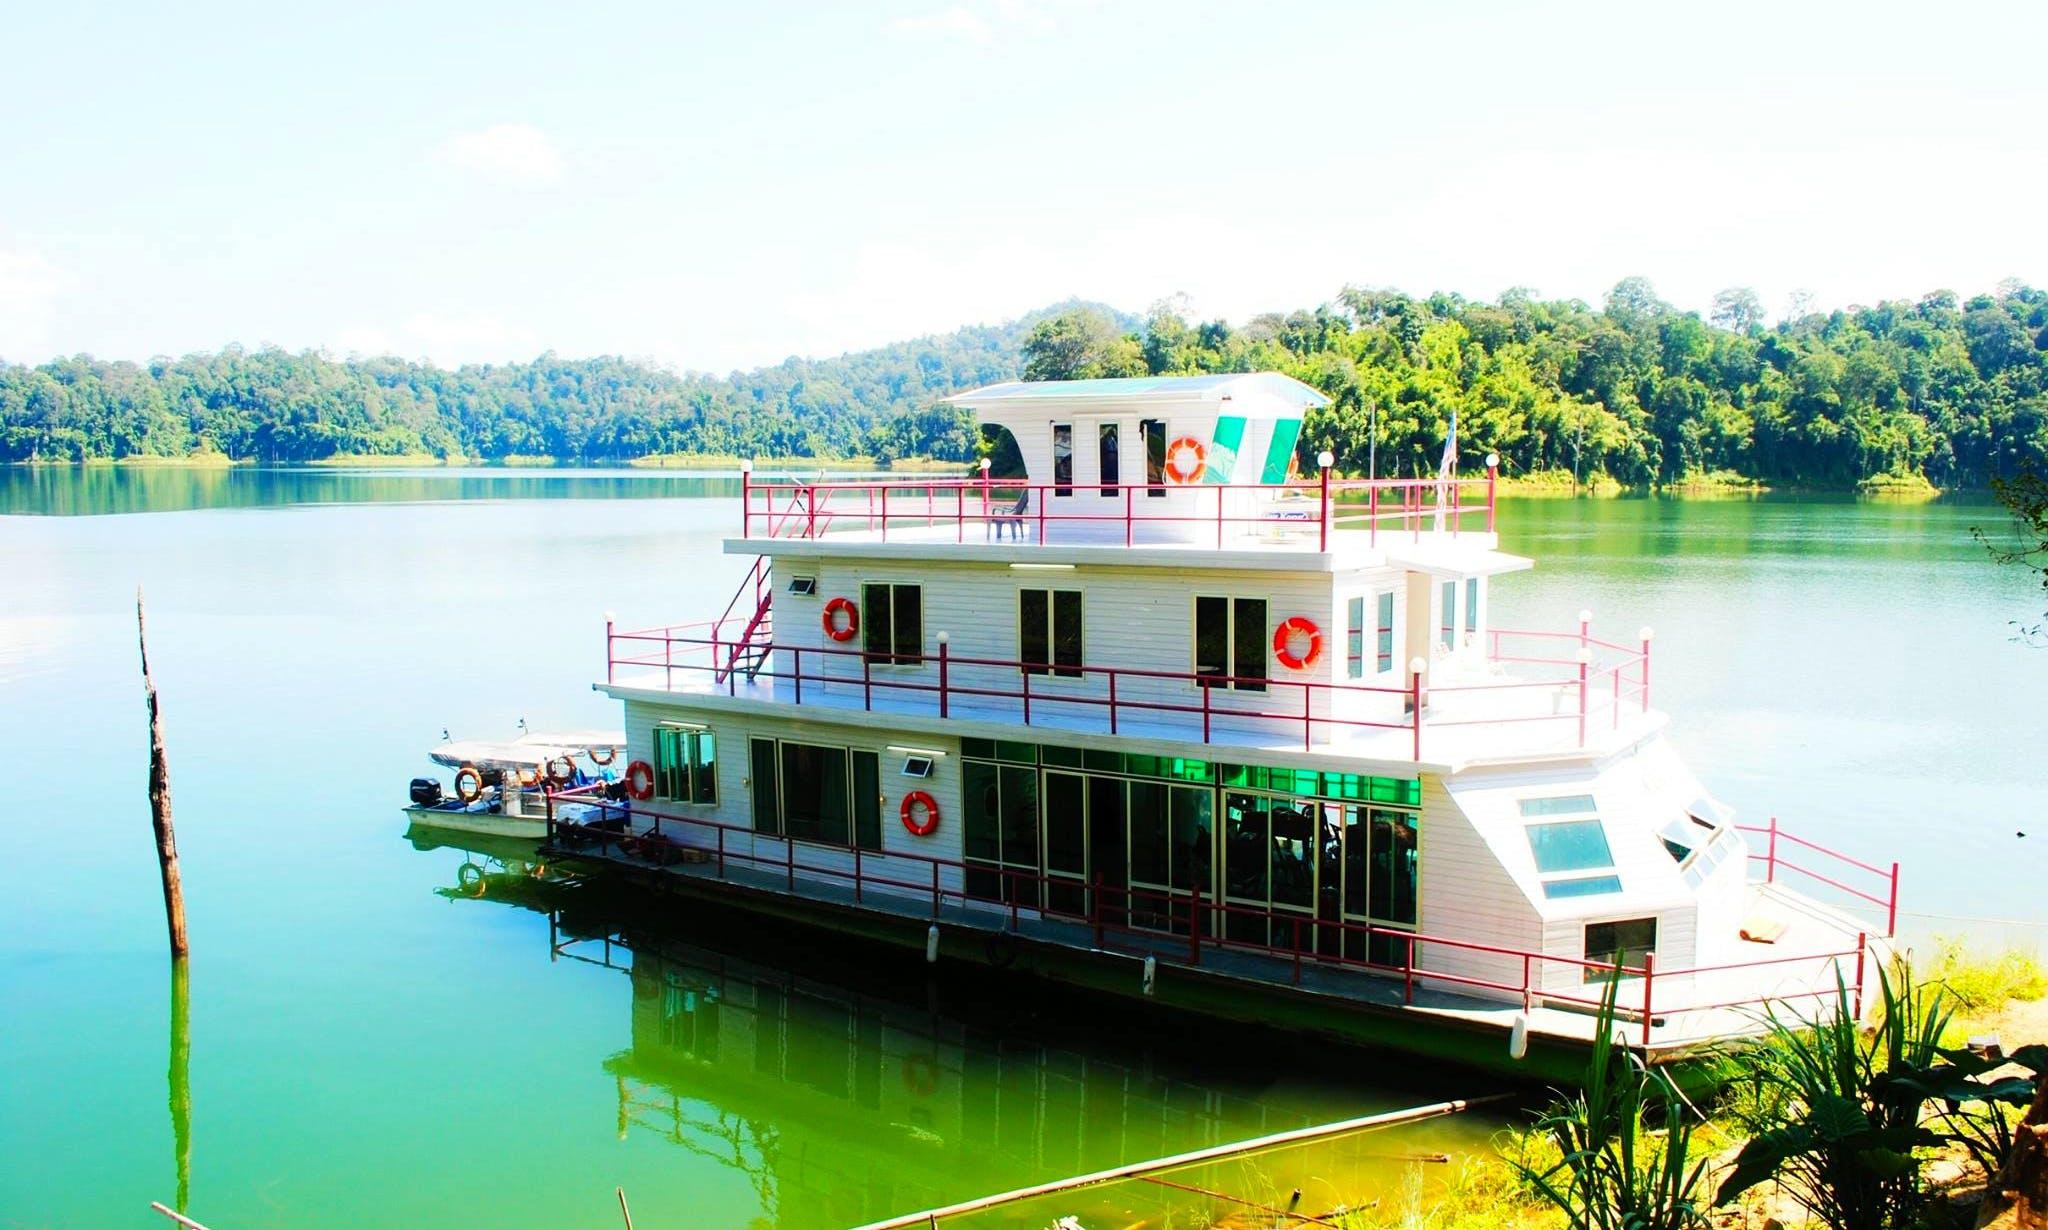 Charter 157' Houseboat in Gerik, Malaysia